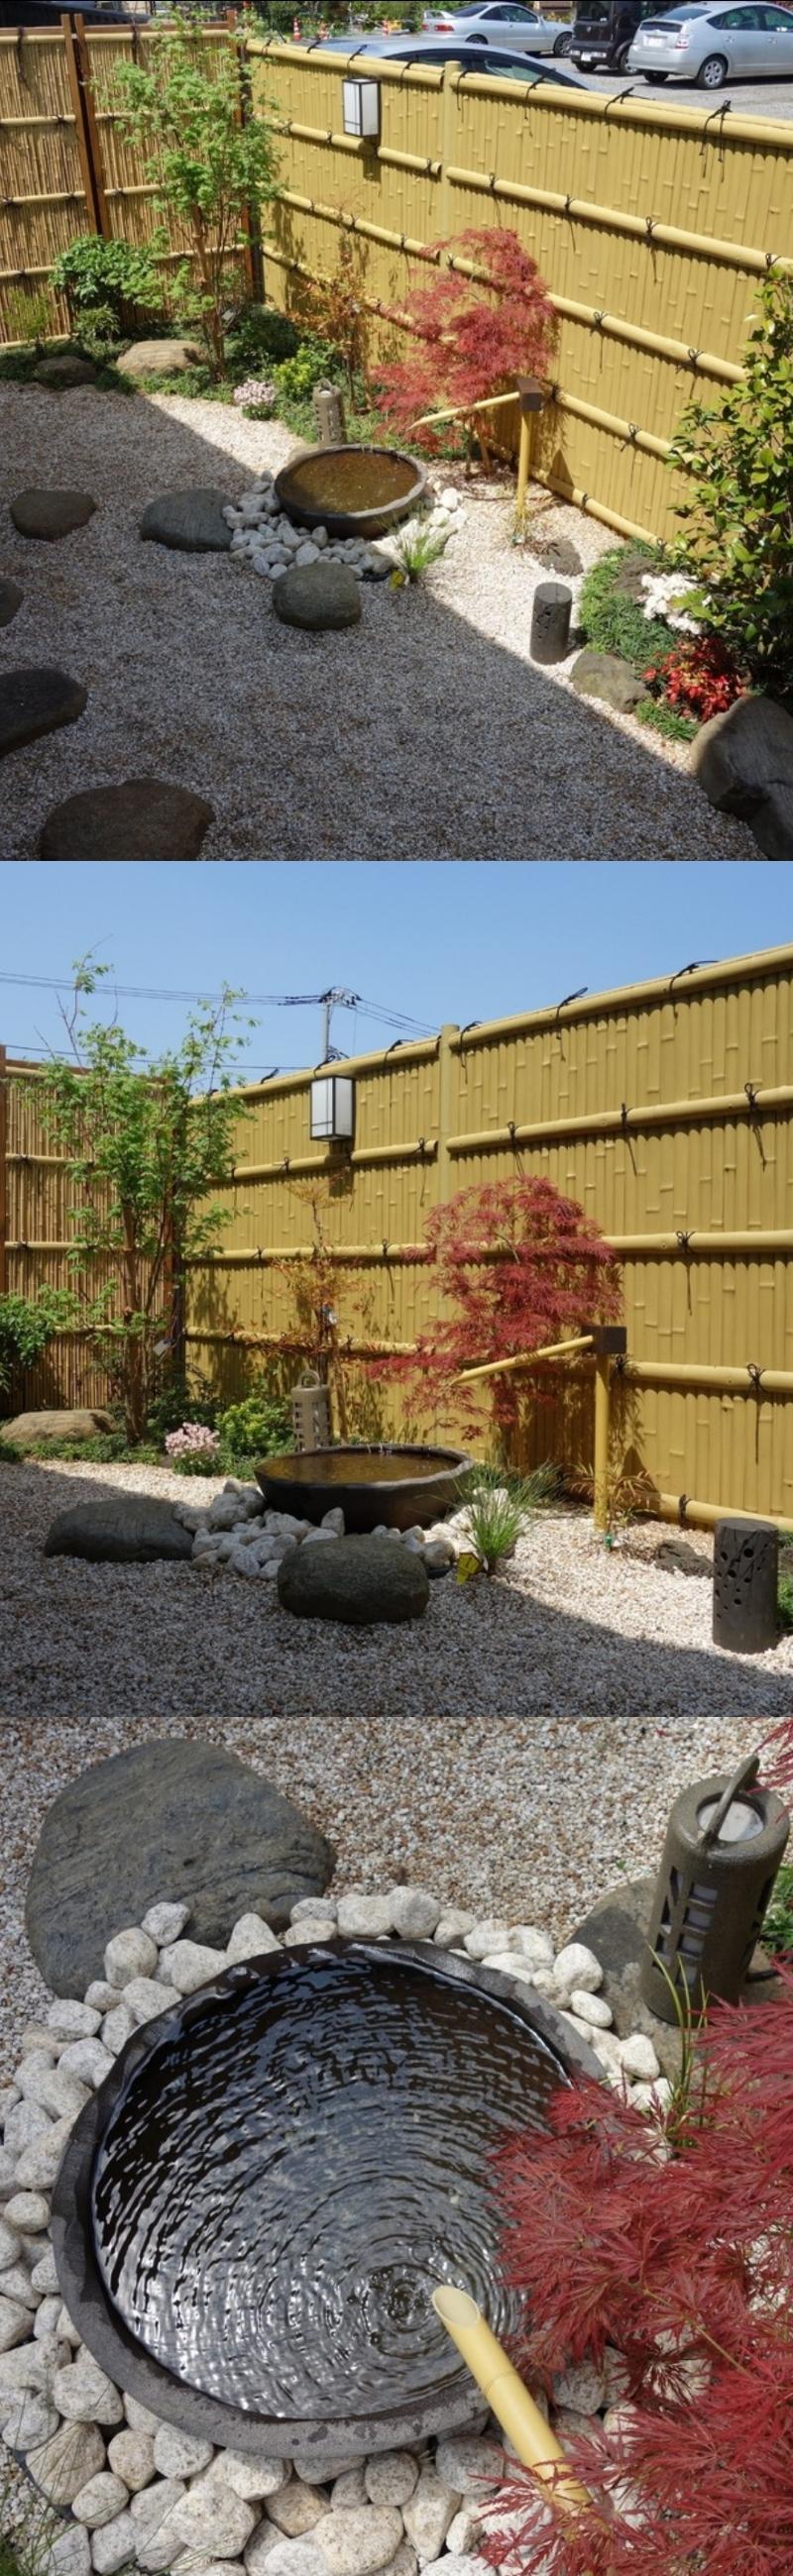 12+ Beautiful Zen Garden Ideas (How to Build & Landscaping Ideas)